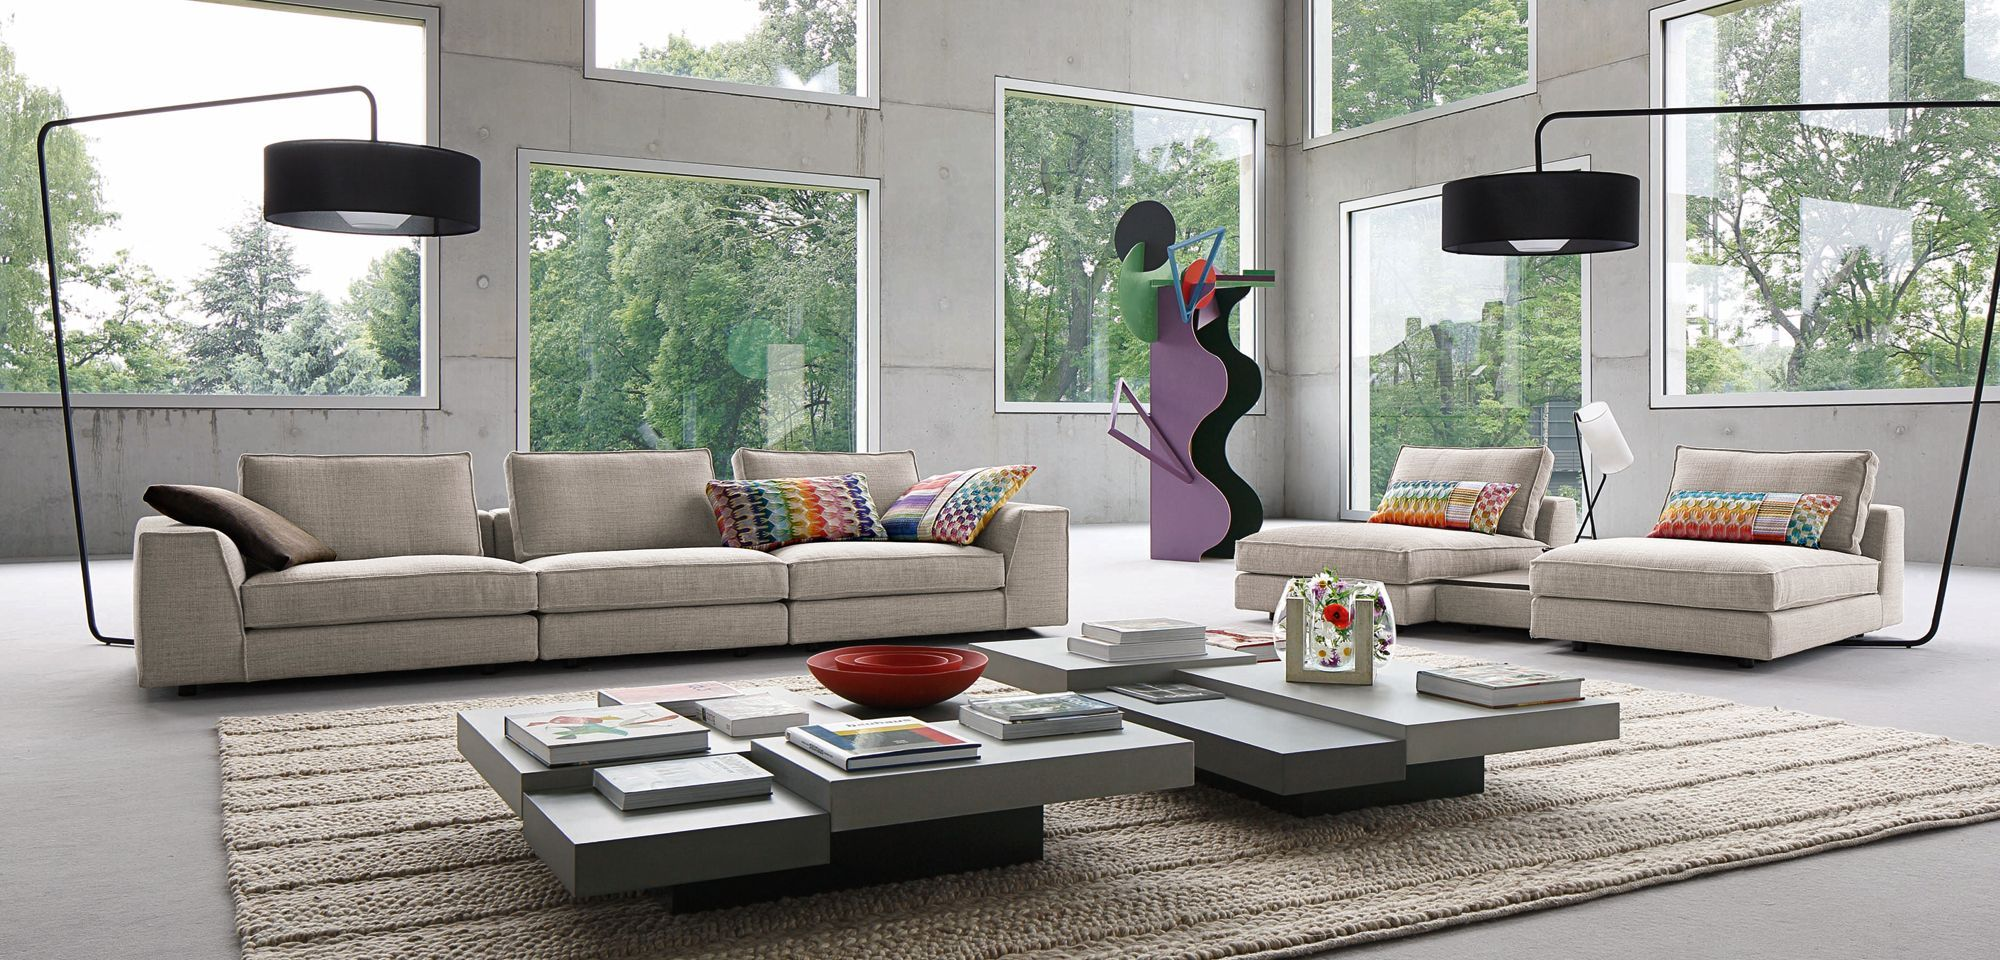 PERLE modular sectional Roche Bobois Living Room